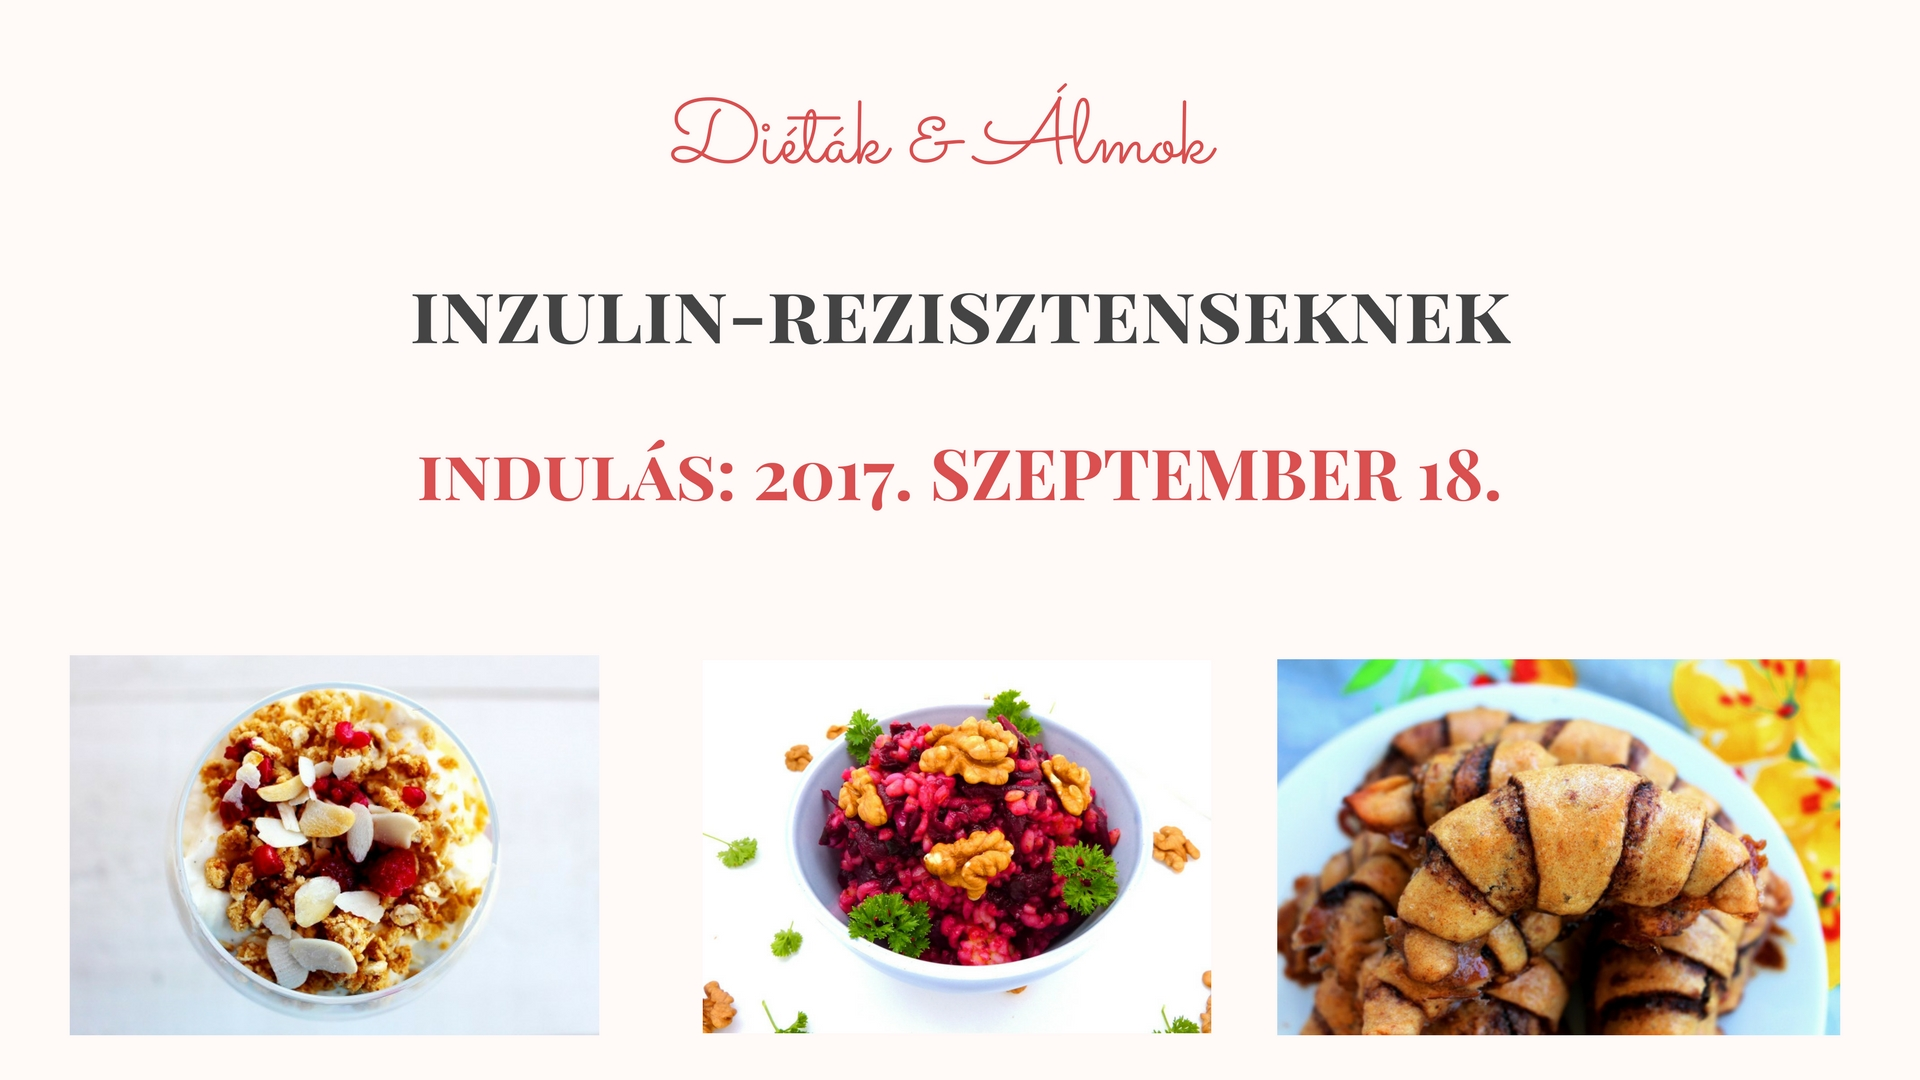 szenhidrat_dieta_tanfolyam_inzulin-rezisztenseknek_6.jpg